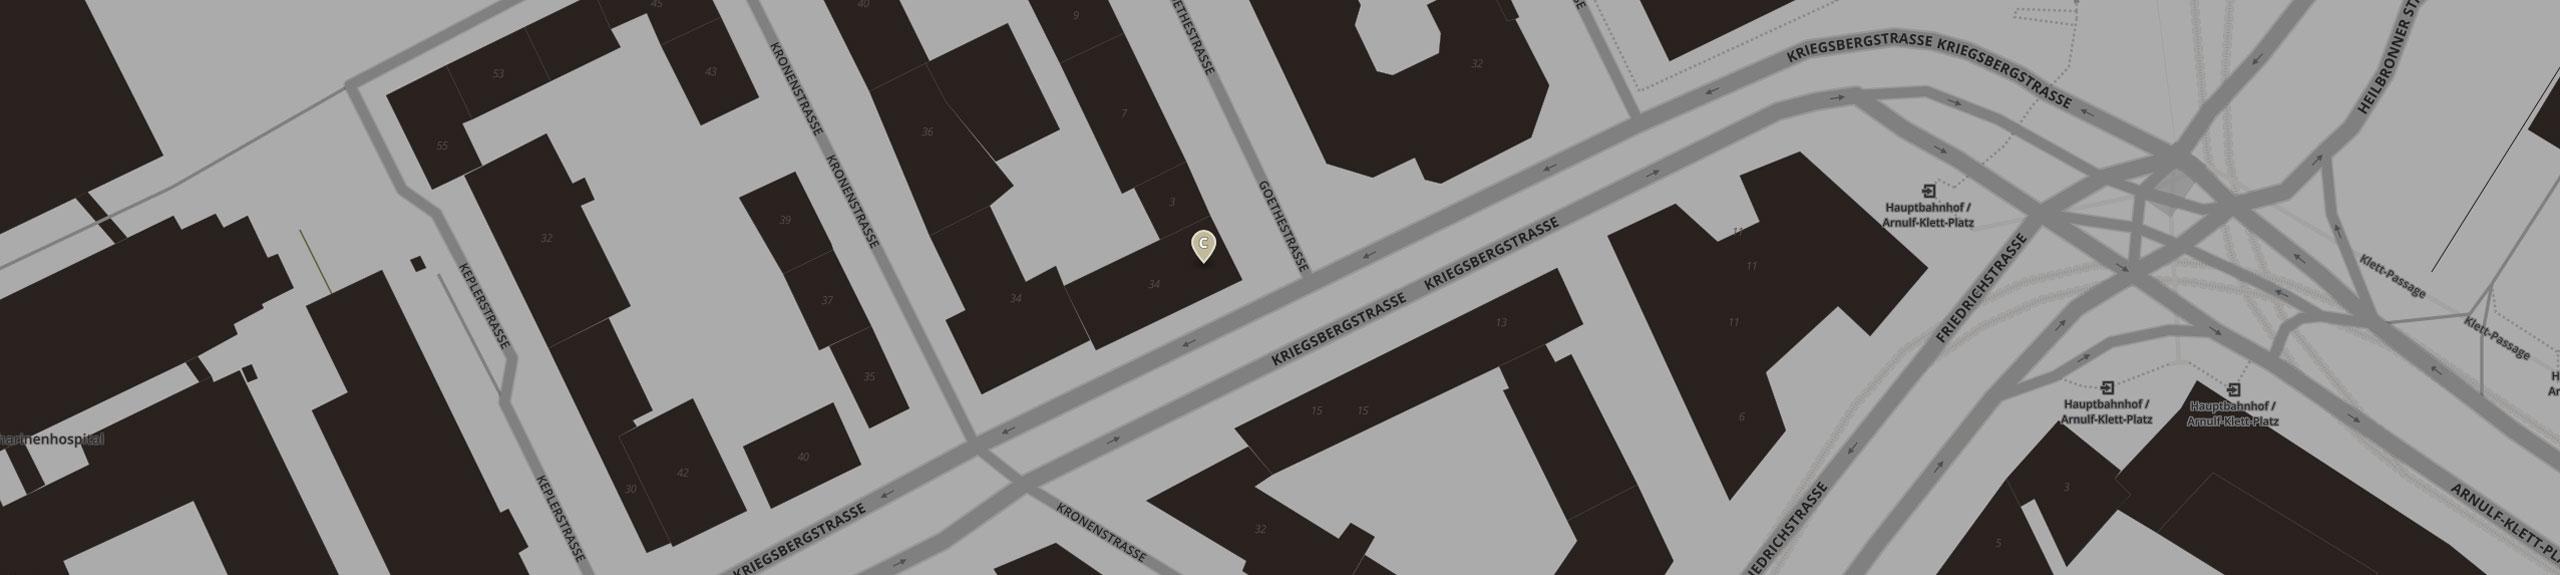 Candela Lichtplanung Standort